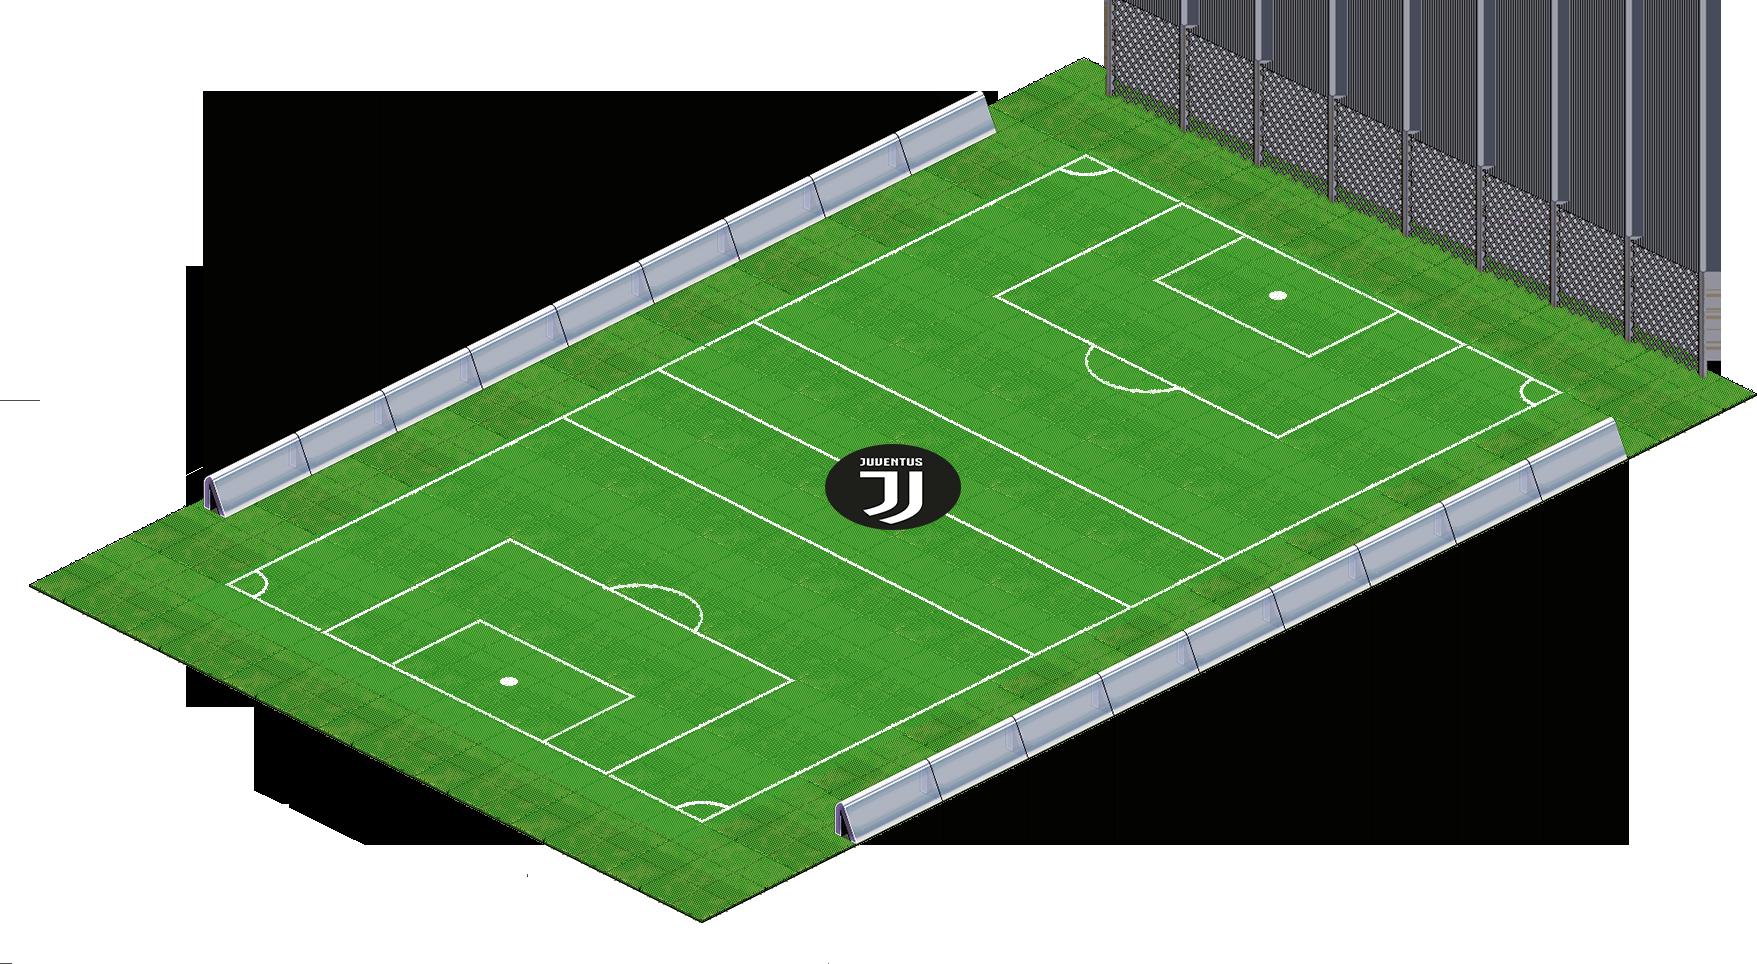 download juve soccer specific stadium full size png image pngkit pngkit